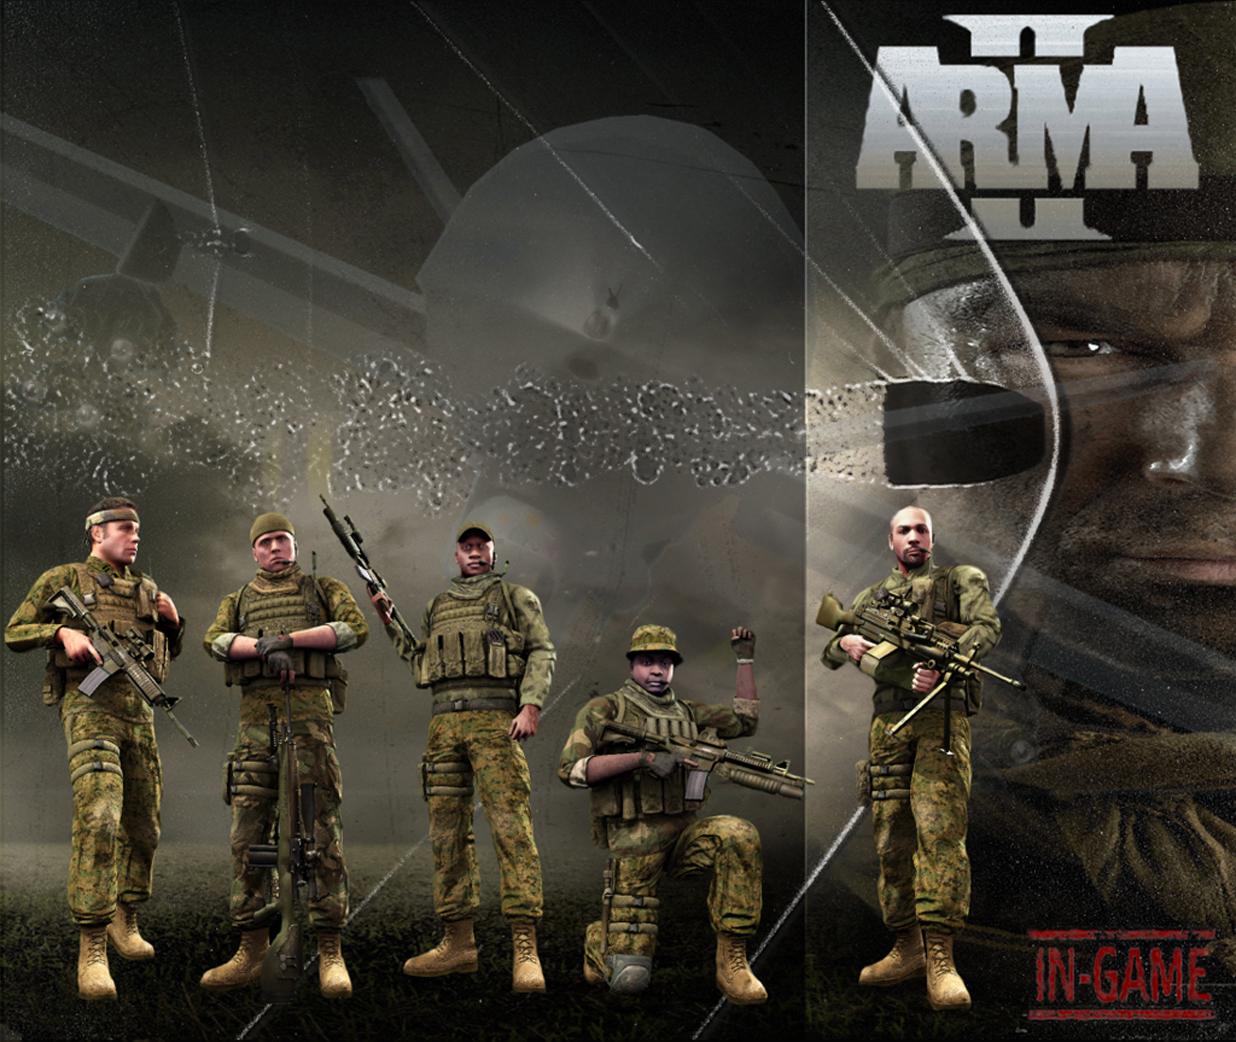 http://3.bp.blogspot.com/-piJCmK7aZ2M/TbevC7EodEI/AAAAAAAABfw/AHlUlW0_-5Y/s1600/Wallpaper_ARMA_II_Reinforcements_PC_Game_8.jpg